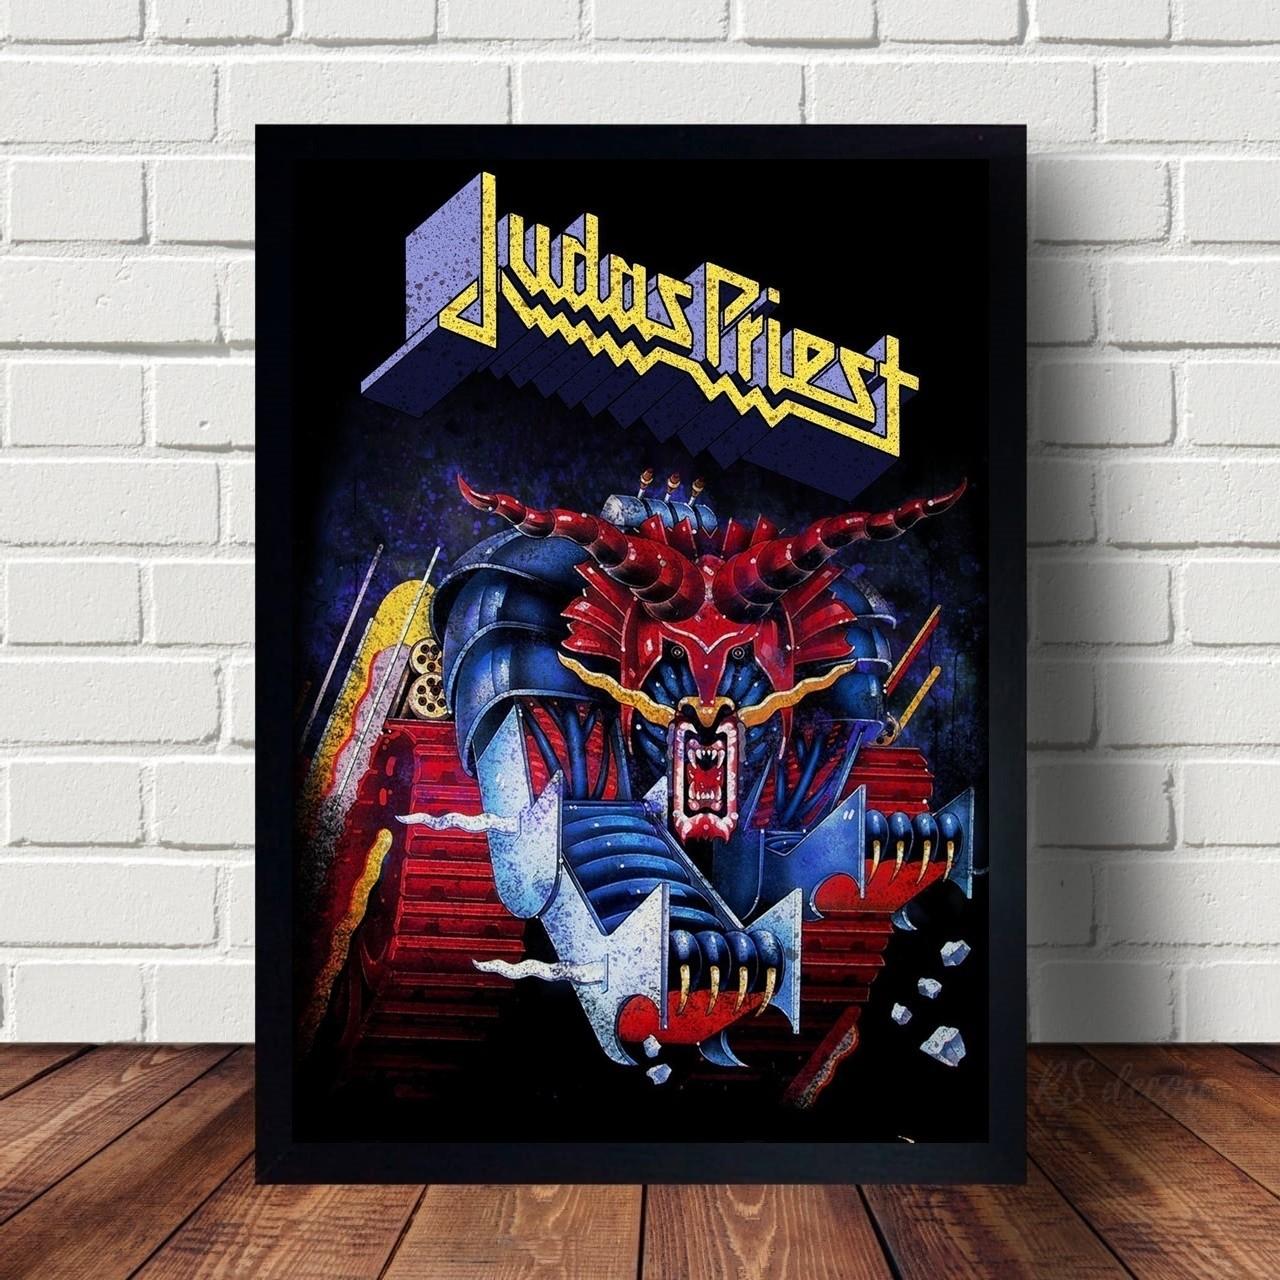 Quadro Decorativo Judas Priest X